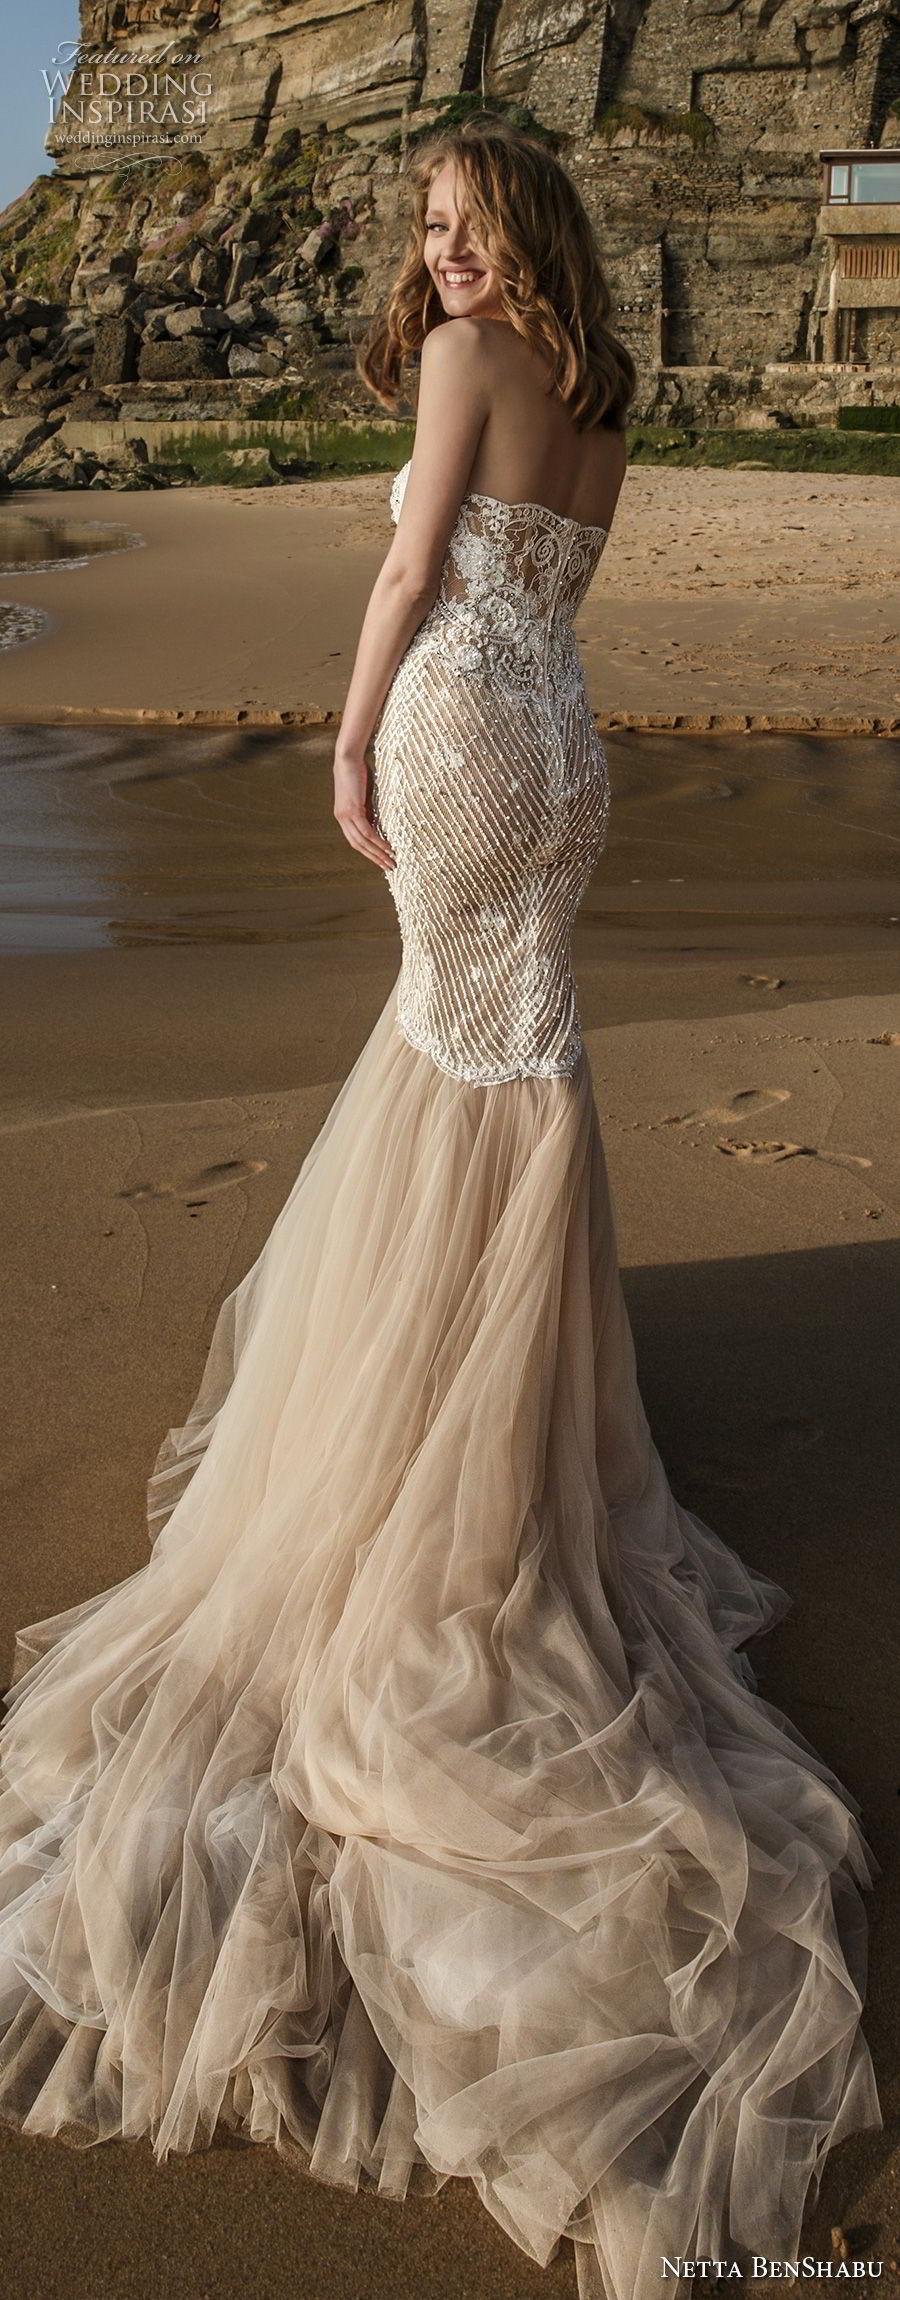 netta benshabu 2017 bridal strapless sweetheart neckline heaily embellished bodice elegant sexy mermaid wedding dress chapel train (23) bv